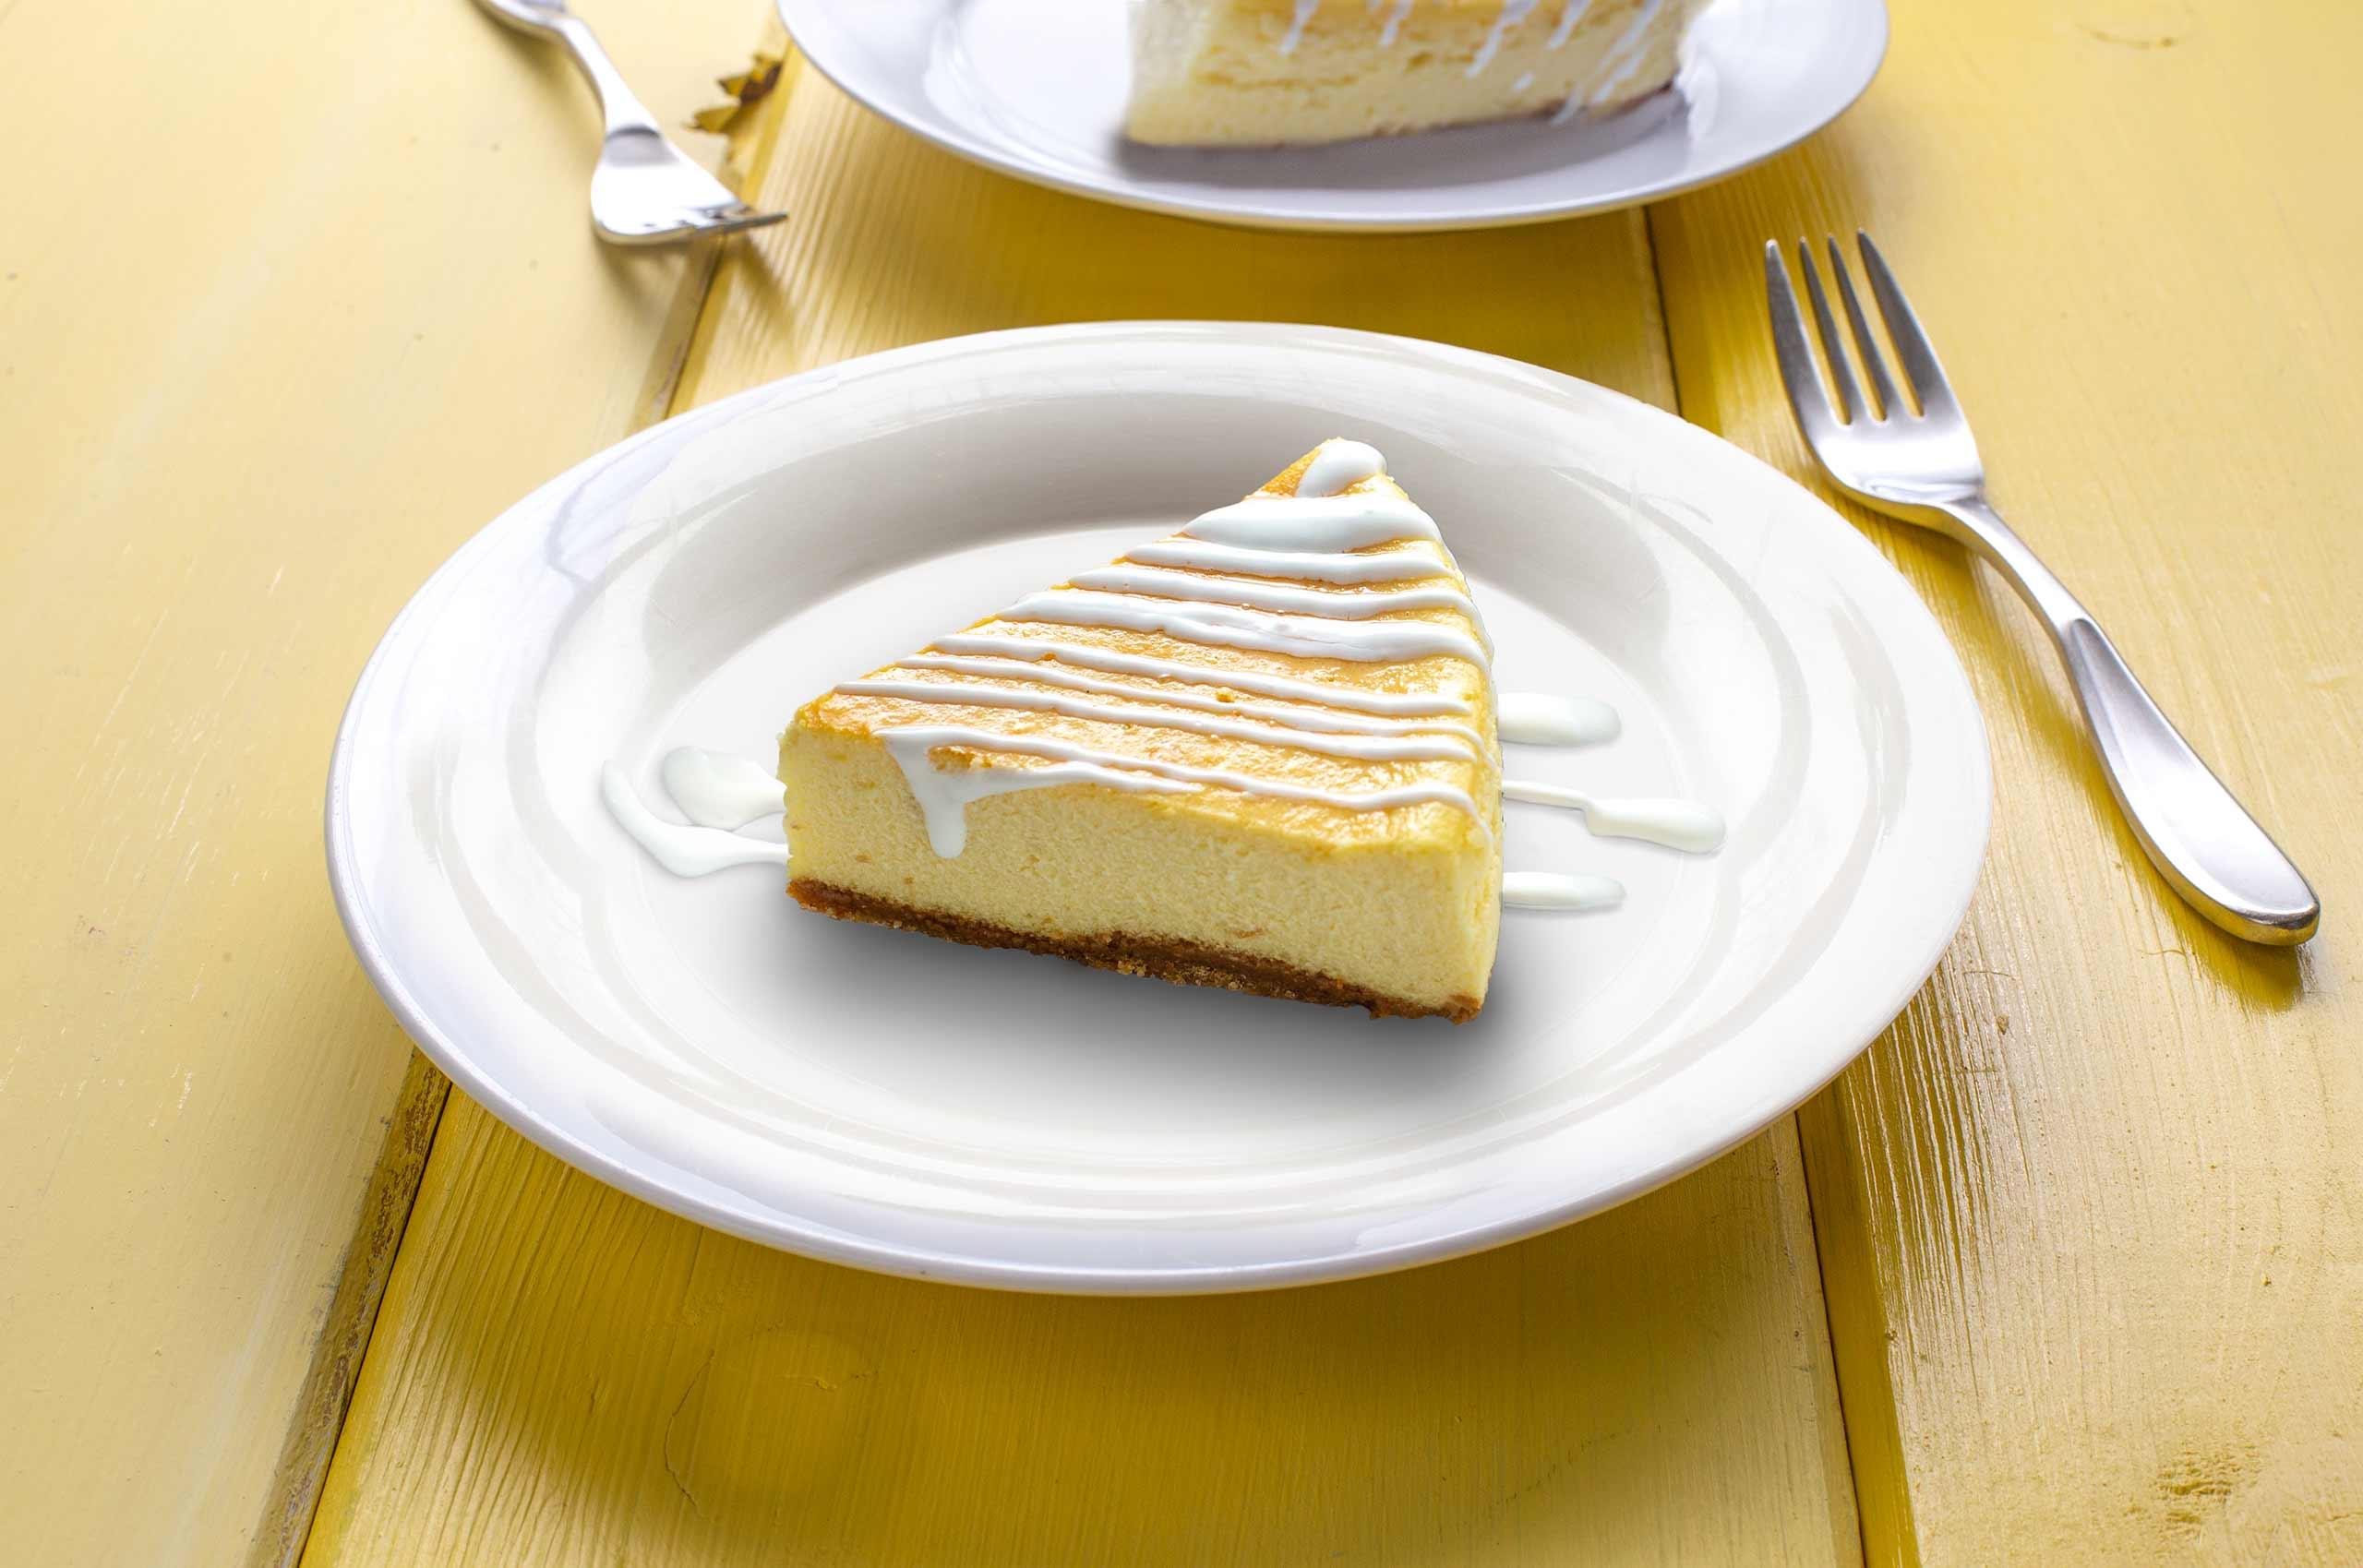 Cheesecake with citrus sour cream sauce